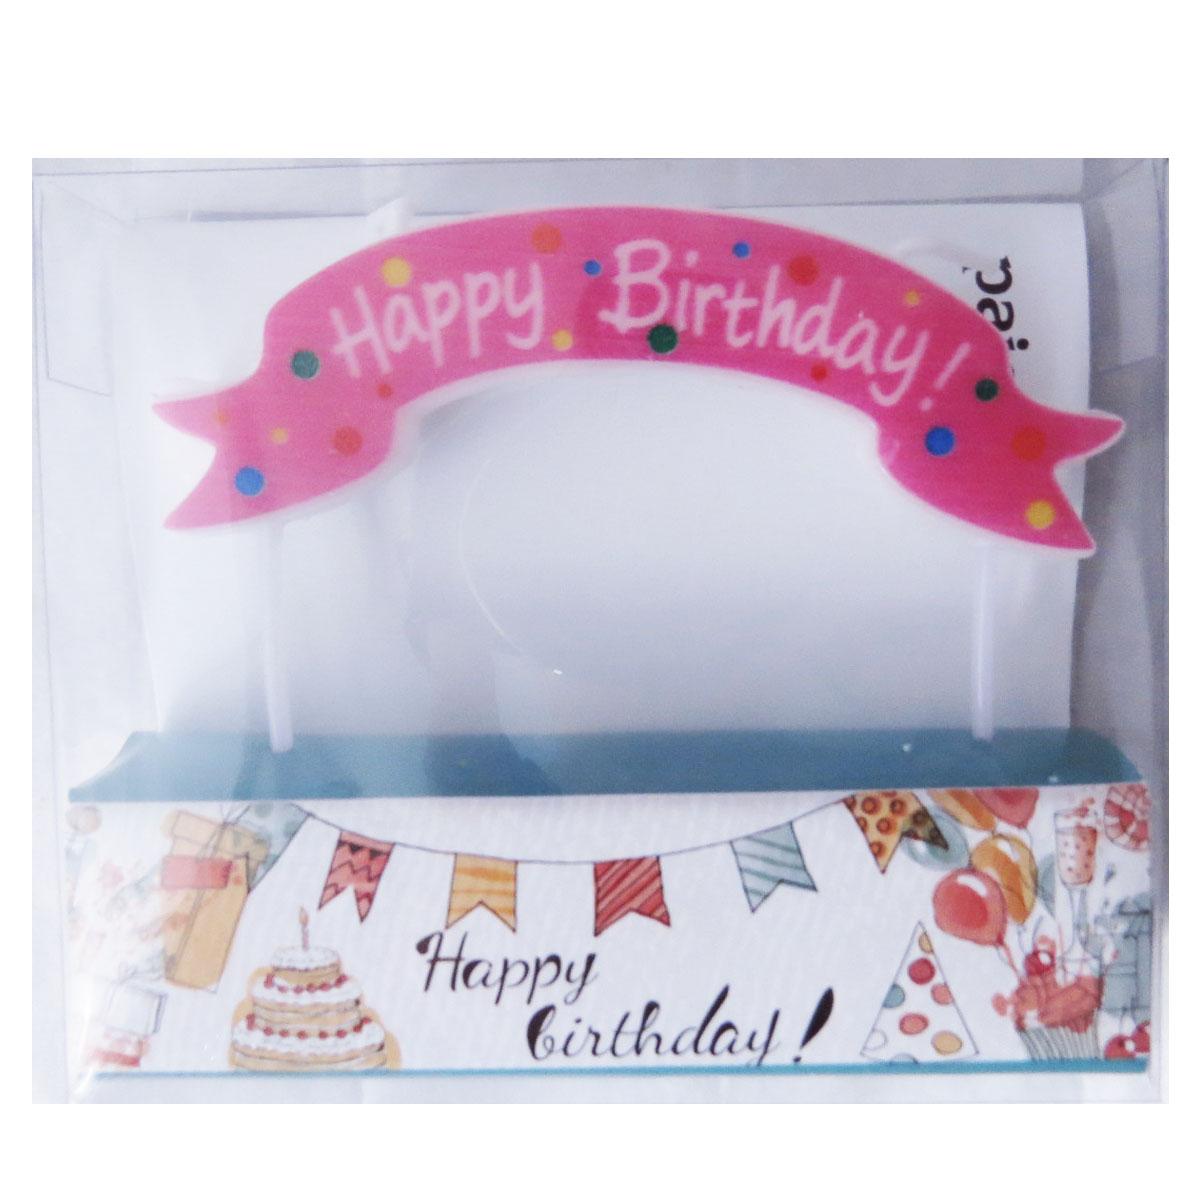 Bougie \'Happy Birthday\' rose (anniversaire) - 9x3 cm - [A2699]